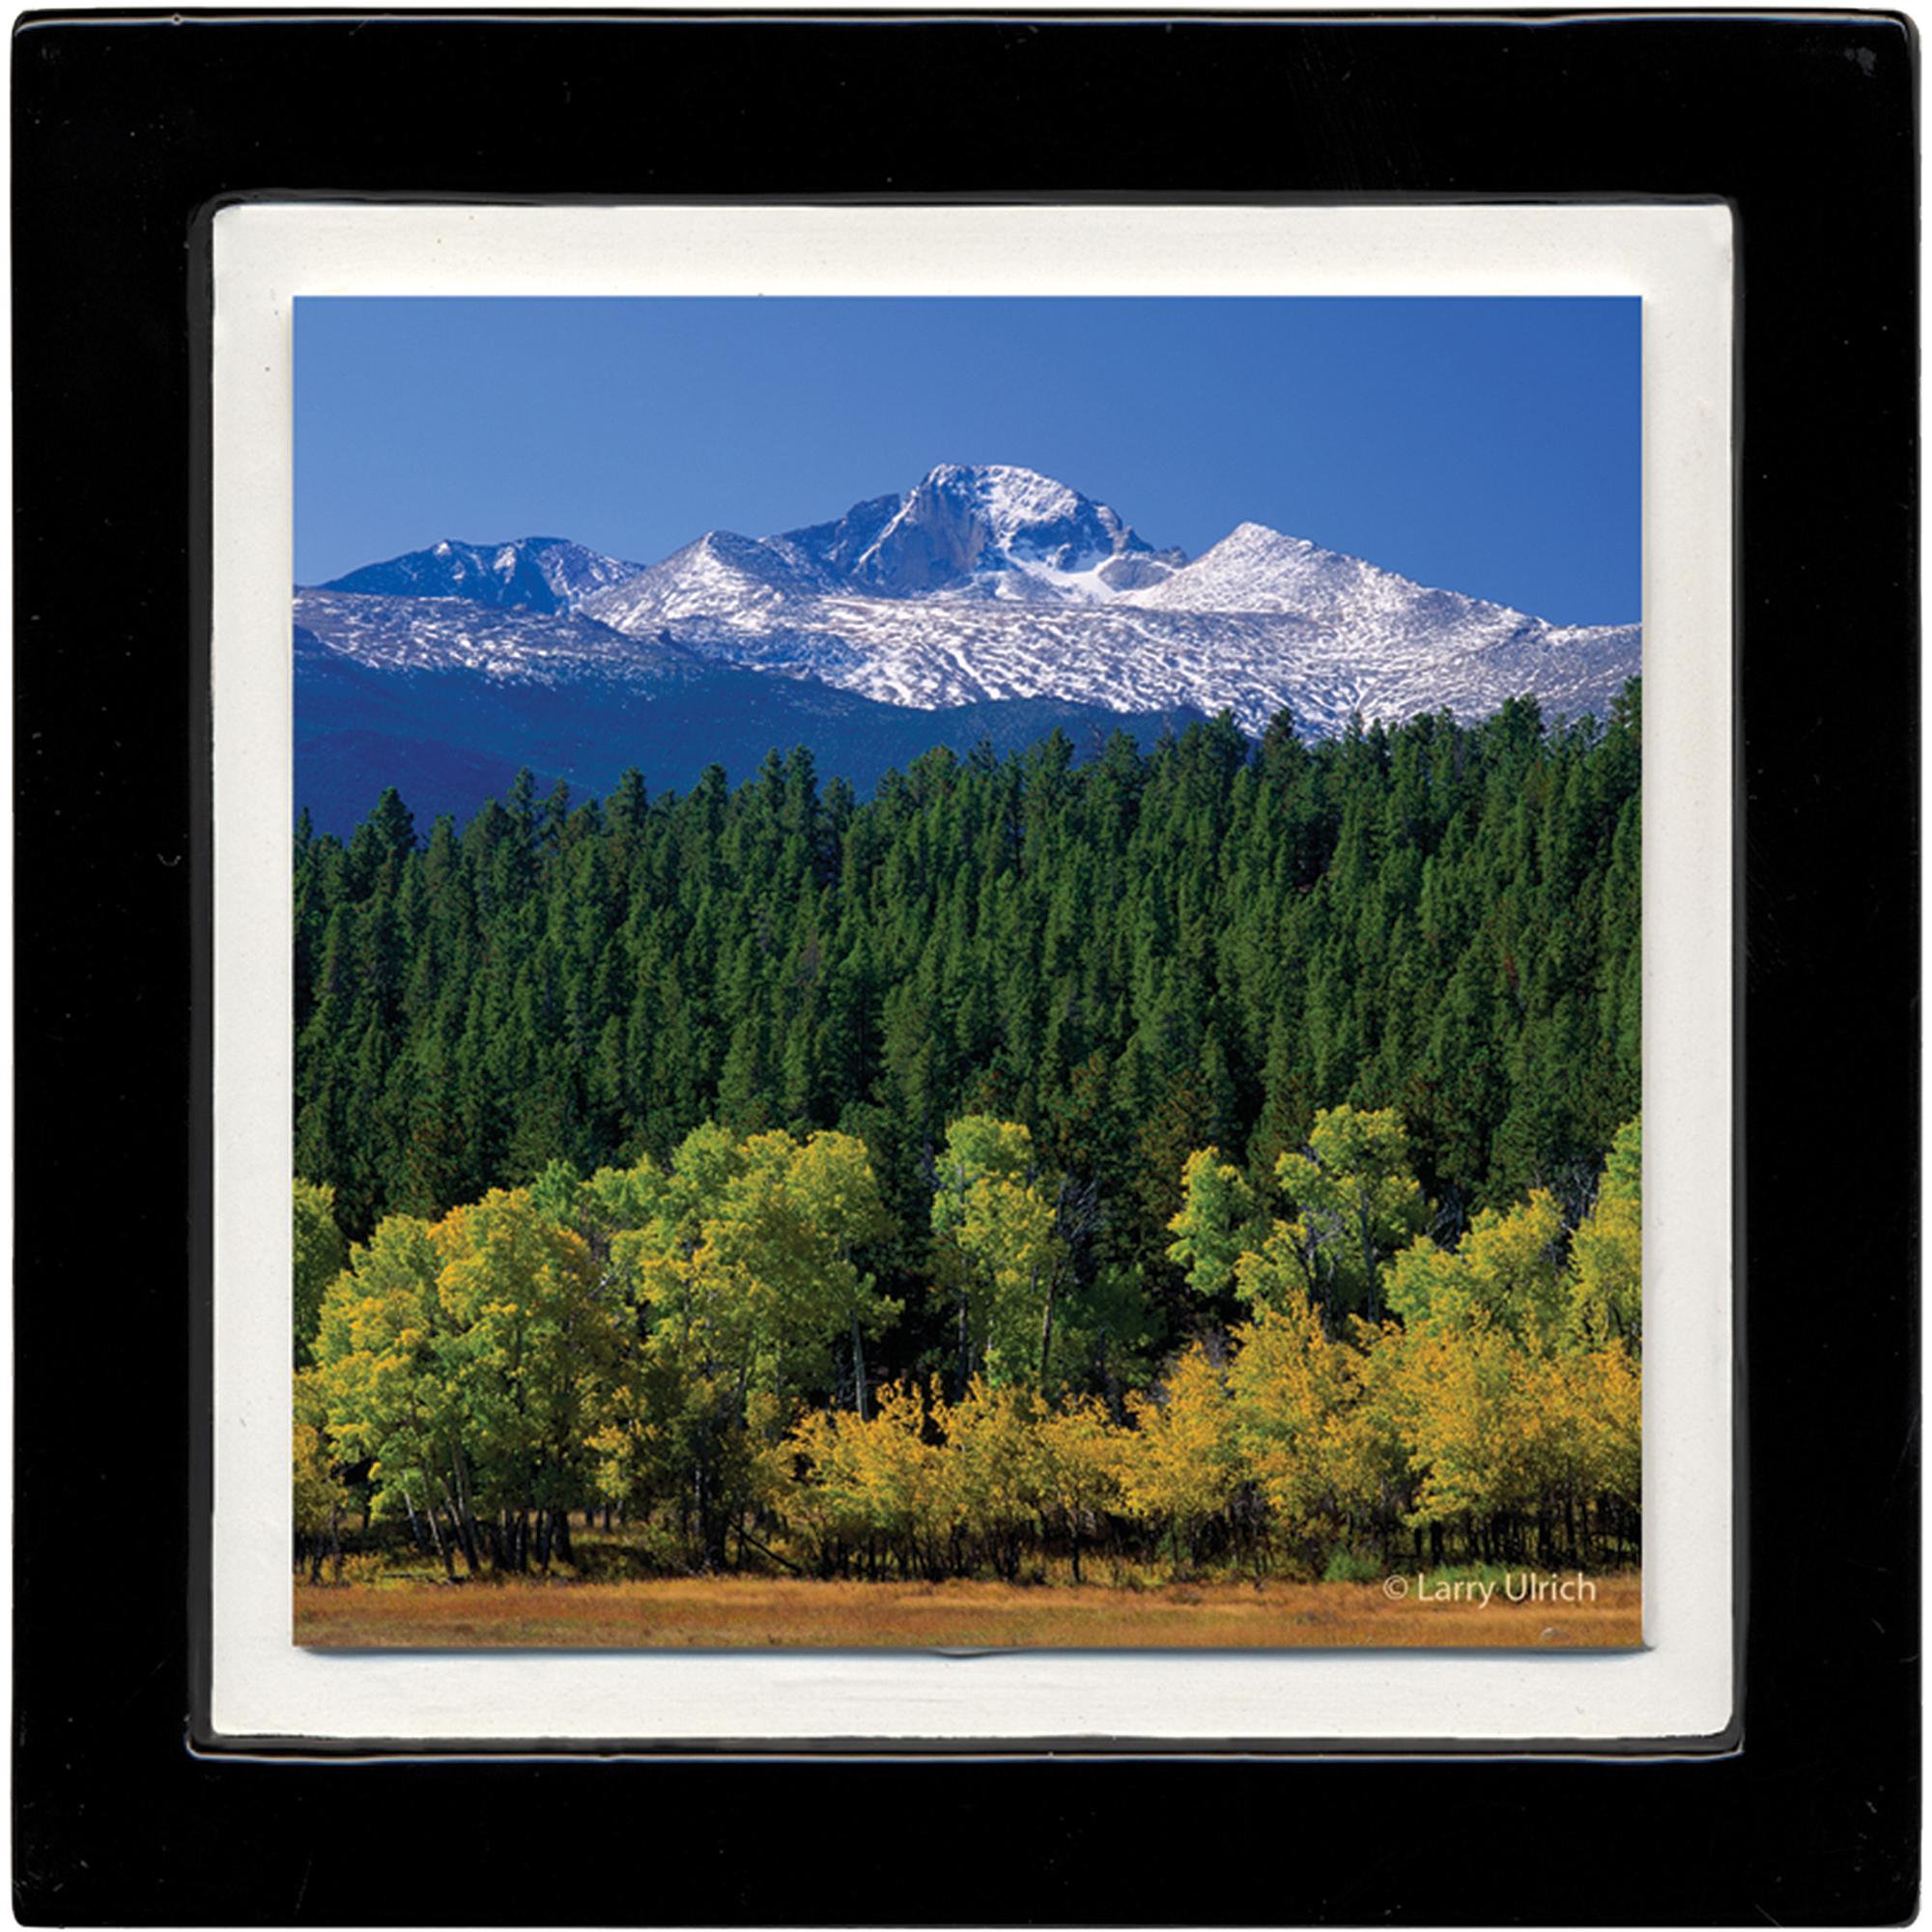 Thirstystone Ambiance Drink Coasters Set, Aspen Landscape, Black